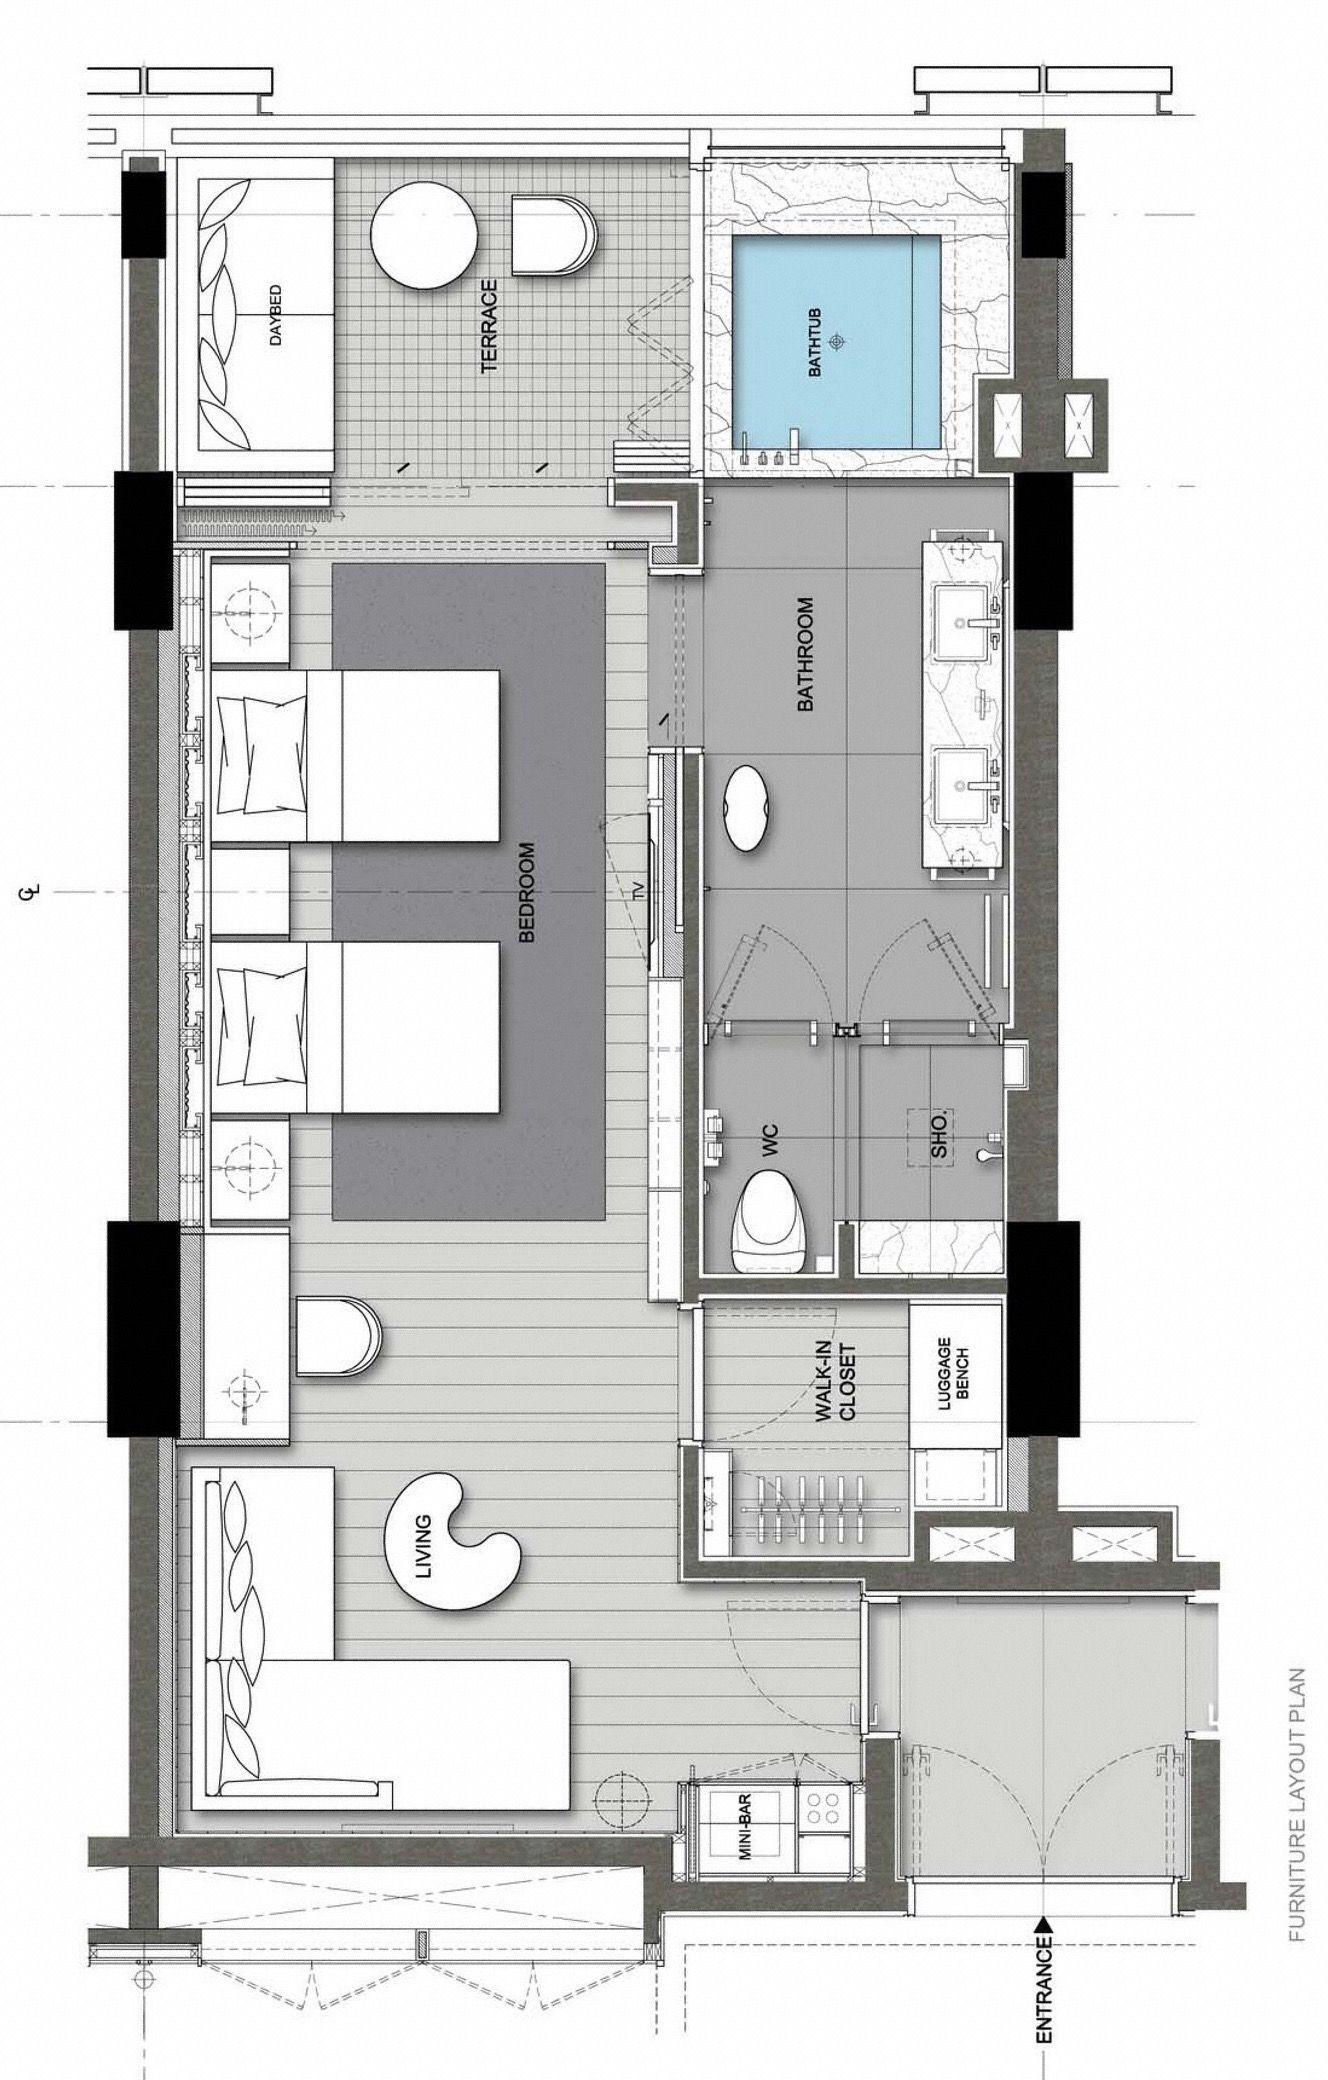 Hotel Room Blueprint: Hotel Floor Plan, Hotel Room Plan, Hotel Room